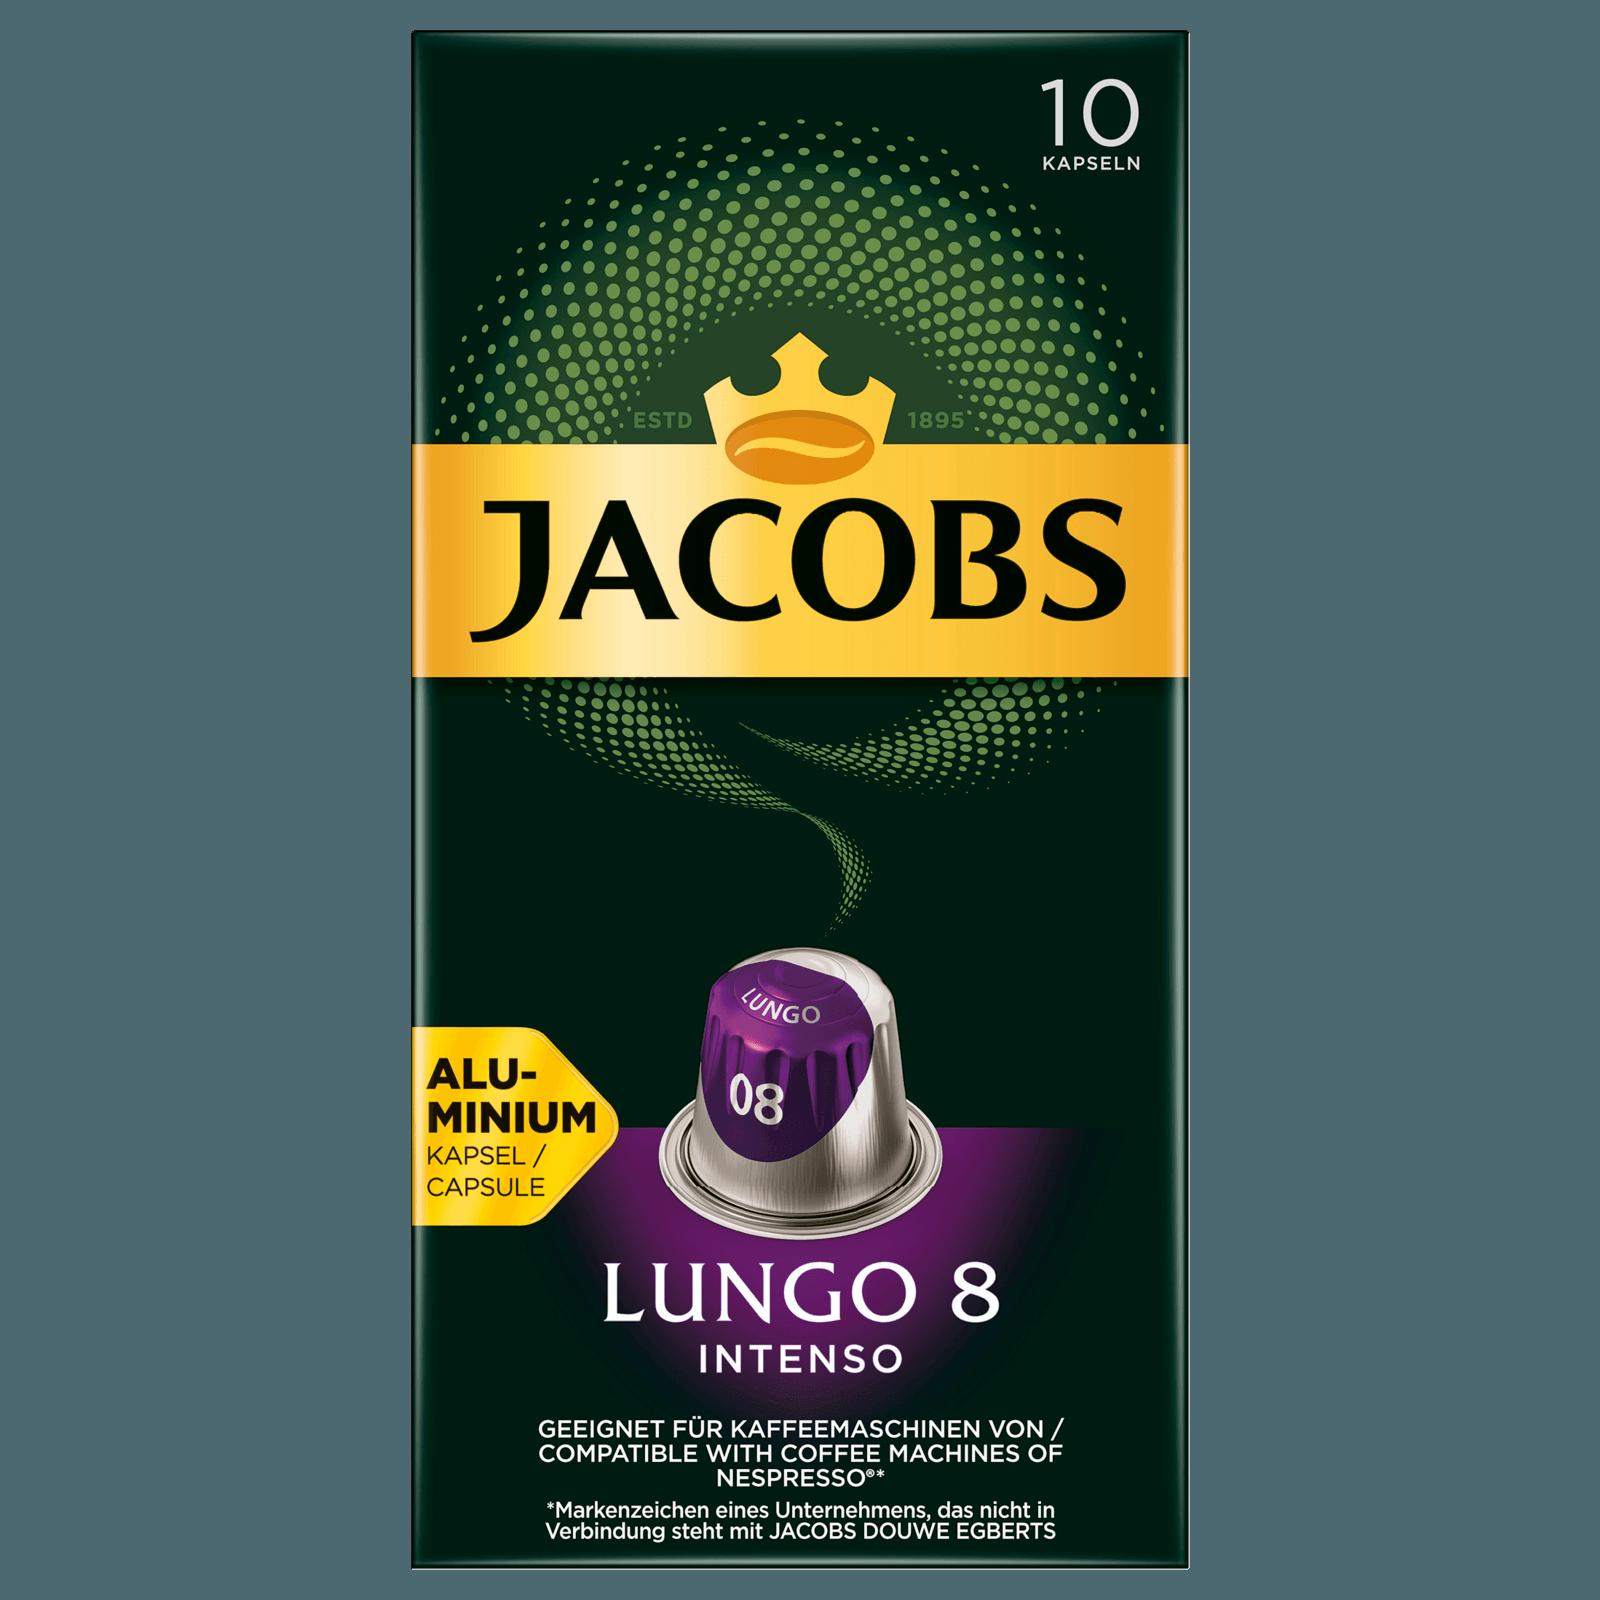 Jacobs Lungo 8 Intenso 52g, 10 Kapseln